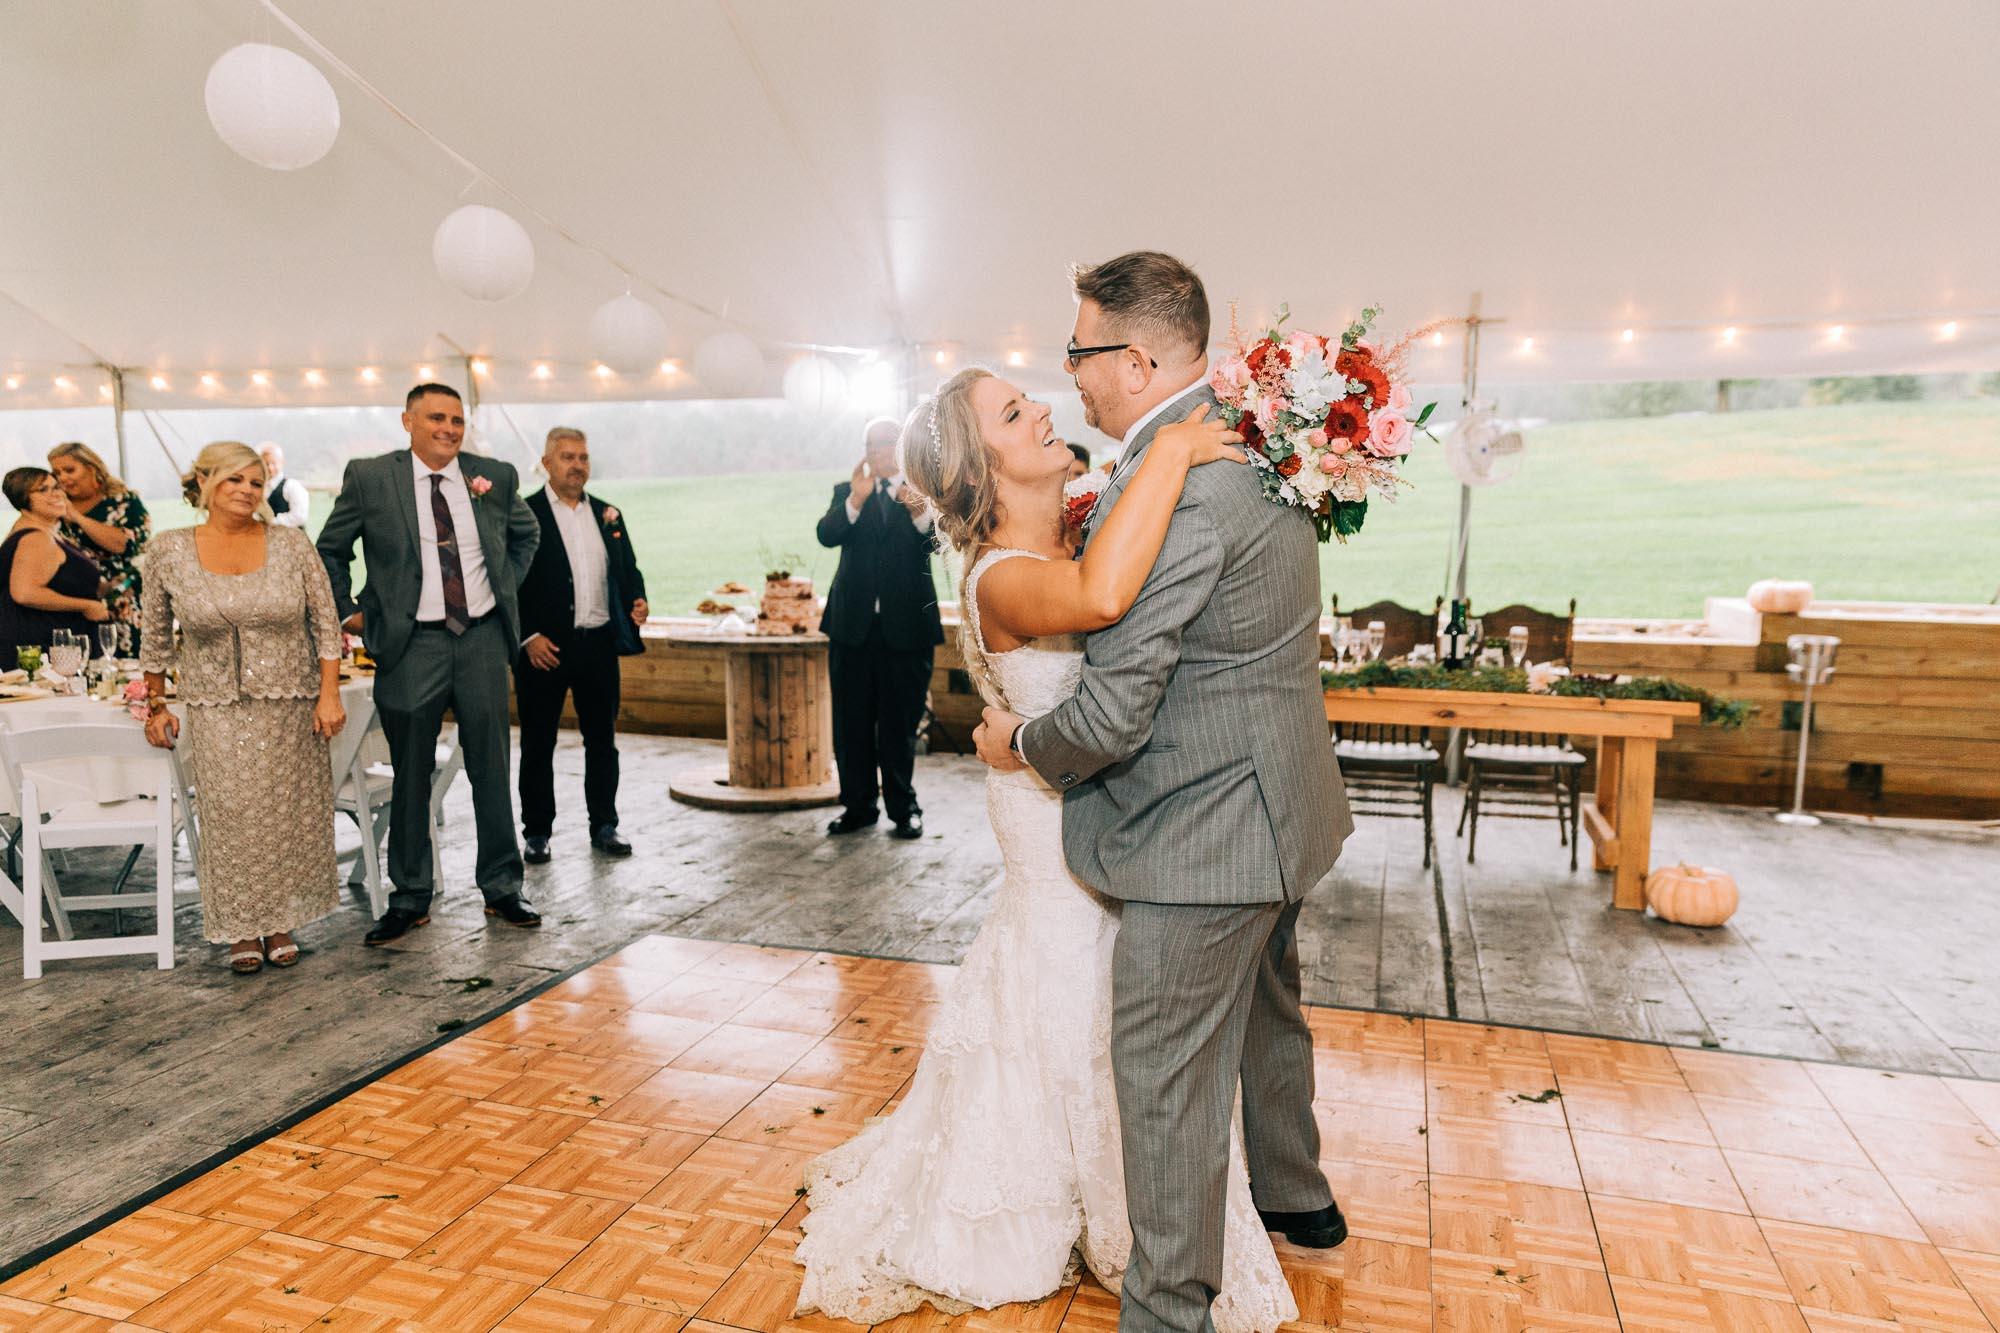 Lodge-at-Raven-Creek-October-wedding-64.jpg